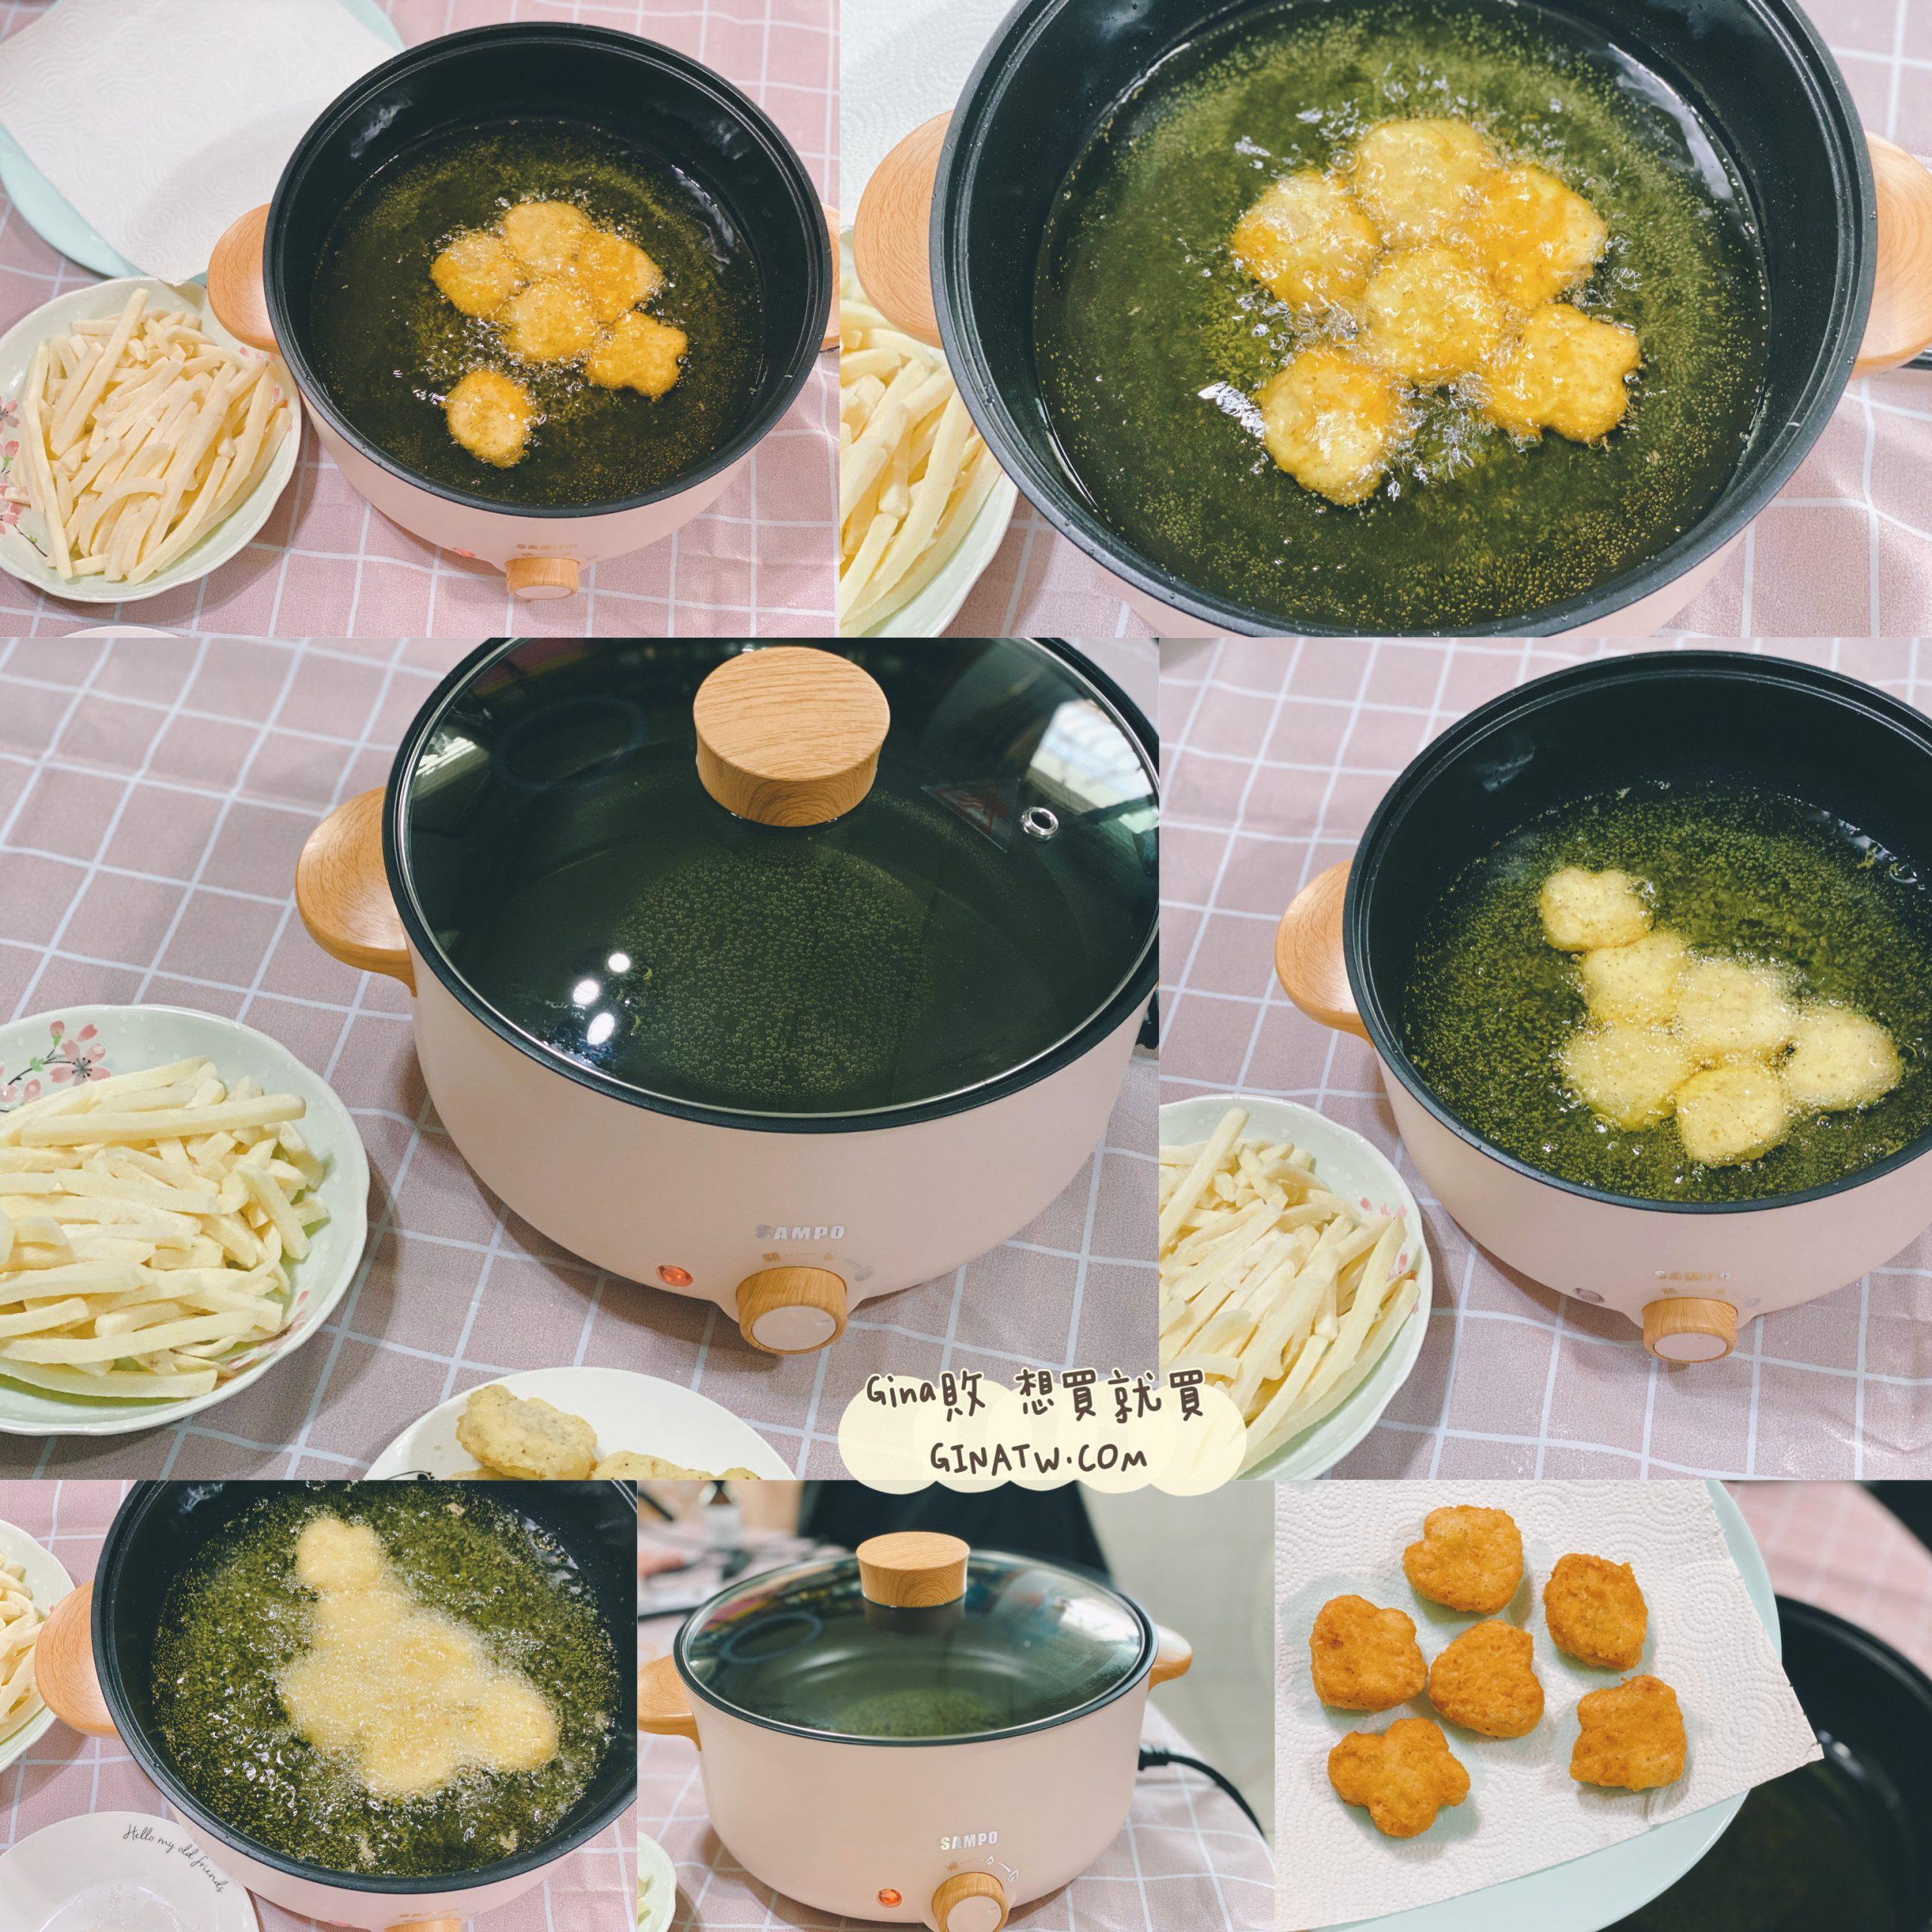 SAMPO聲寶日系多功能電鍋團購|TQ-B19301CL|3公升料理鍋 @GINA環球旅行生活